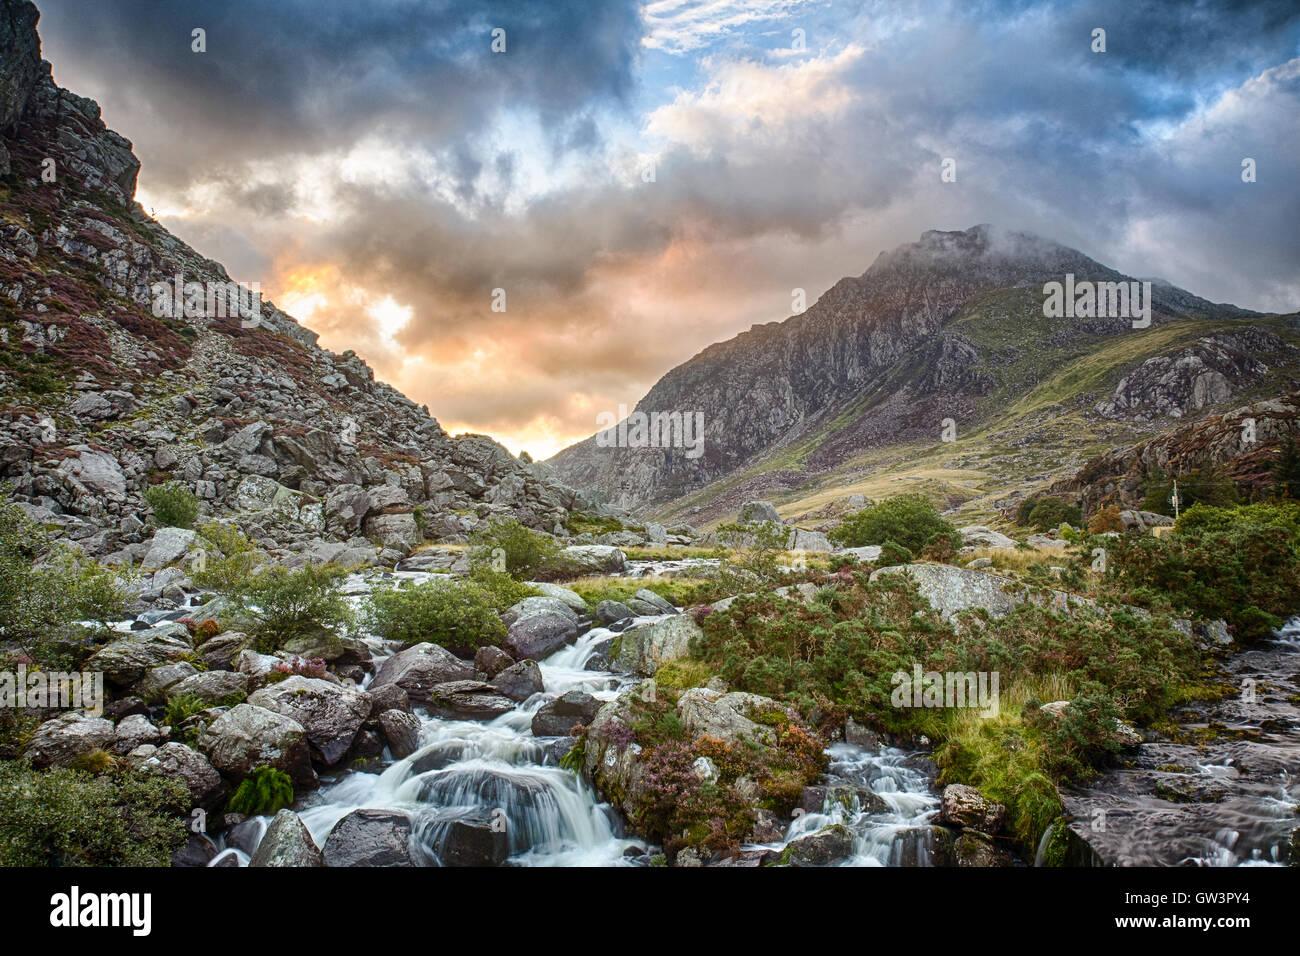 Mountain and fall near LLyn Ogwen lake in Wales - Stock Image